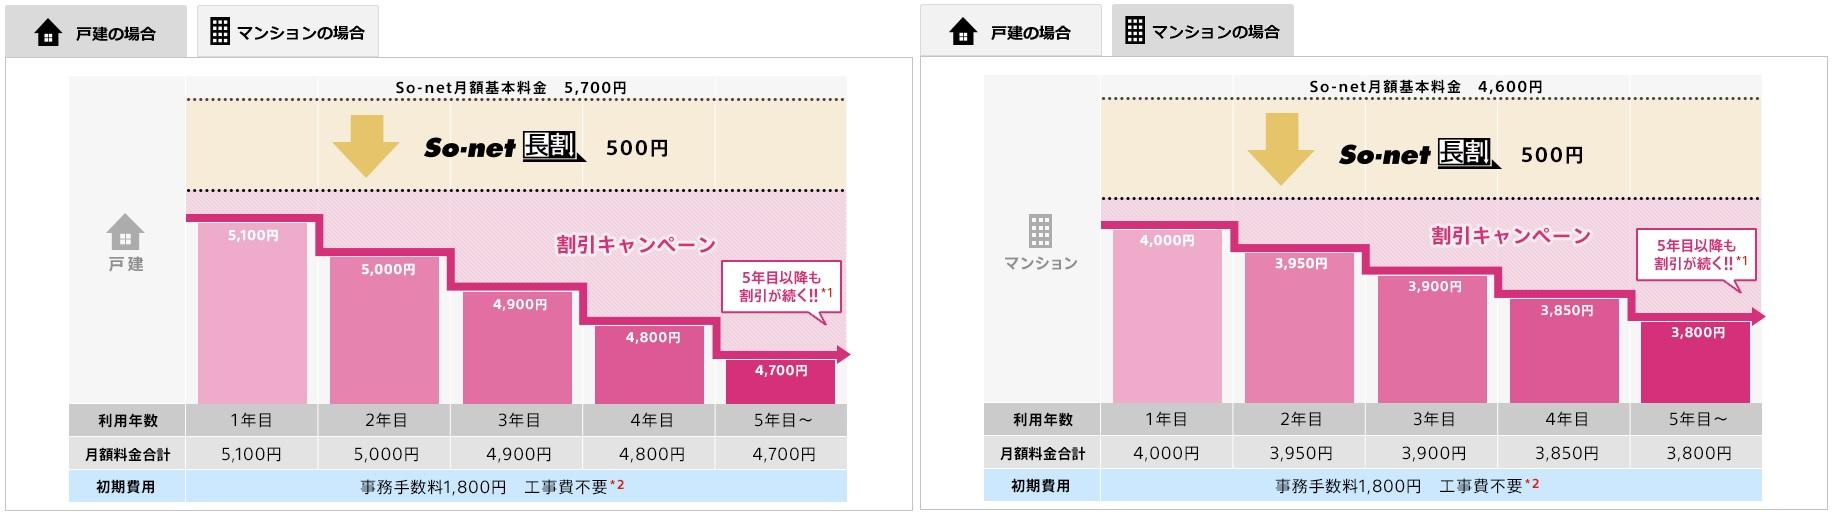 So-net光長割キャンペーン